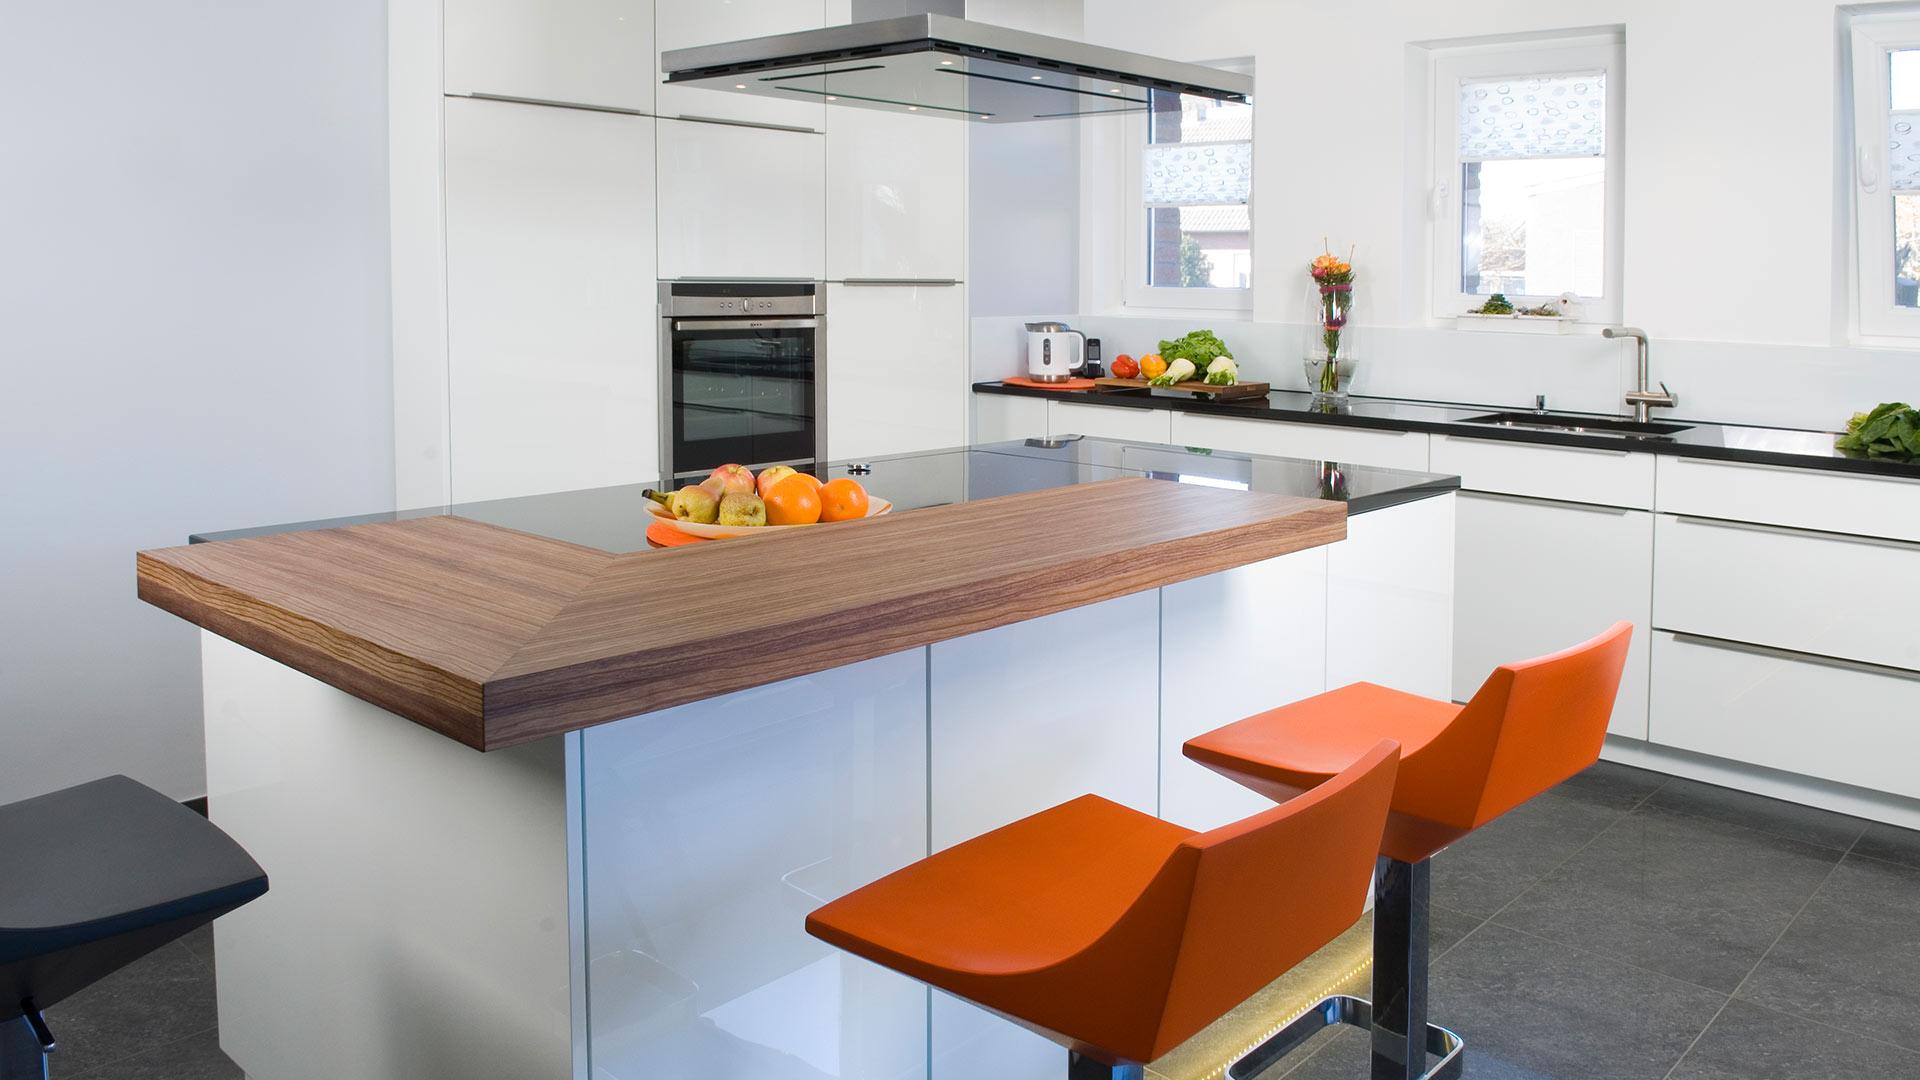 musterk chen nrw. Black Bedroom Furniture Sets. Home Design Ideas